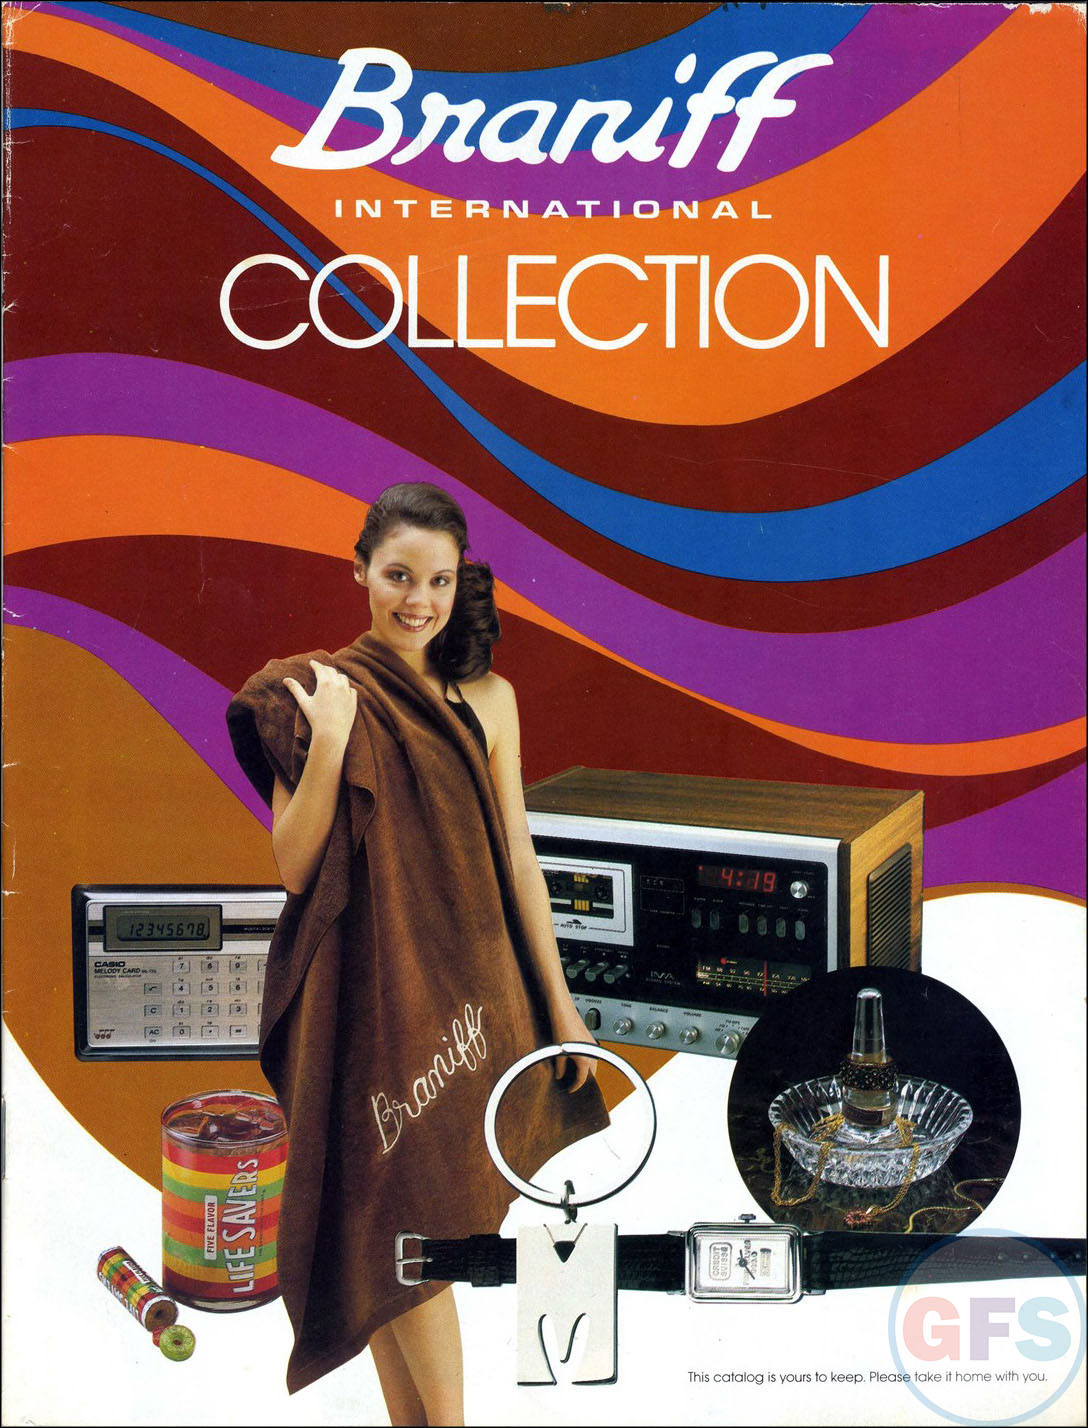 Airline memories 2 braniff international collection for International collection